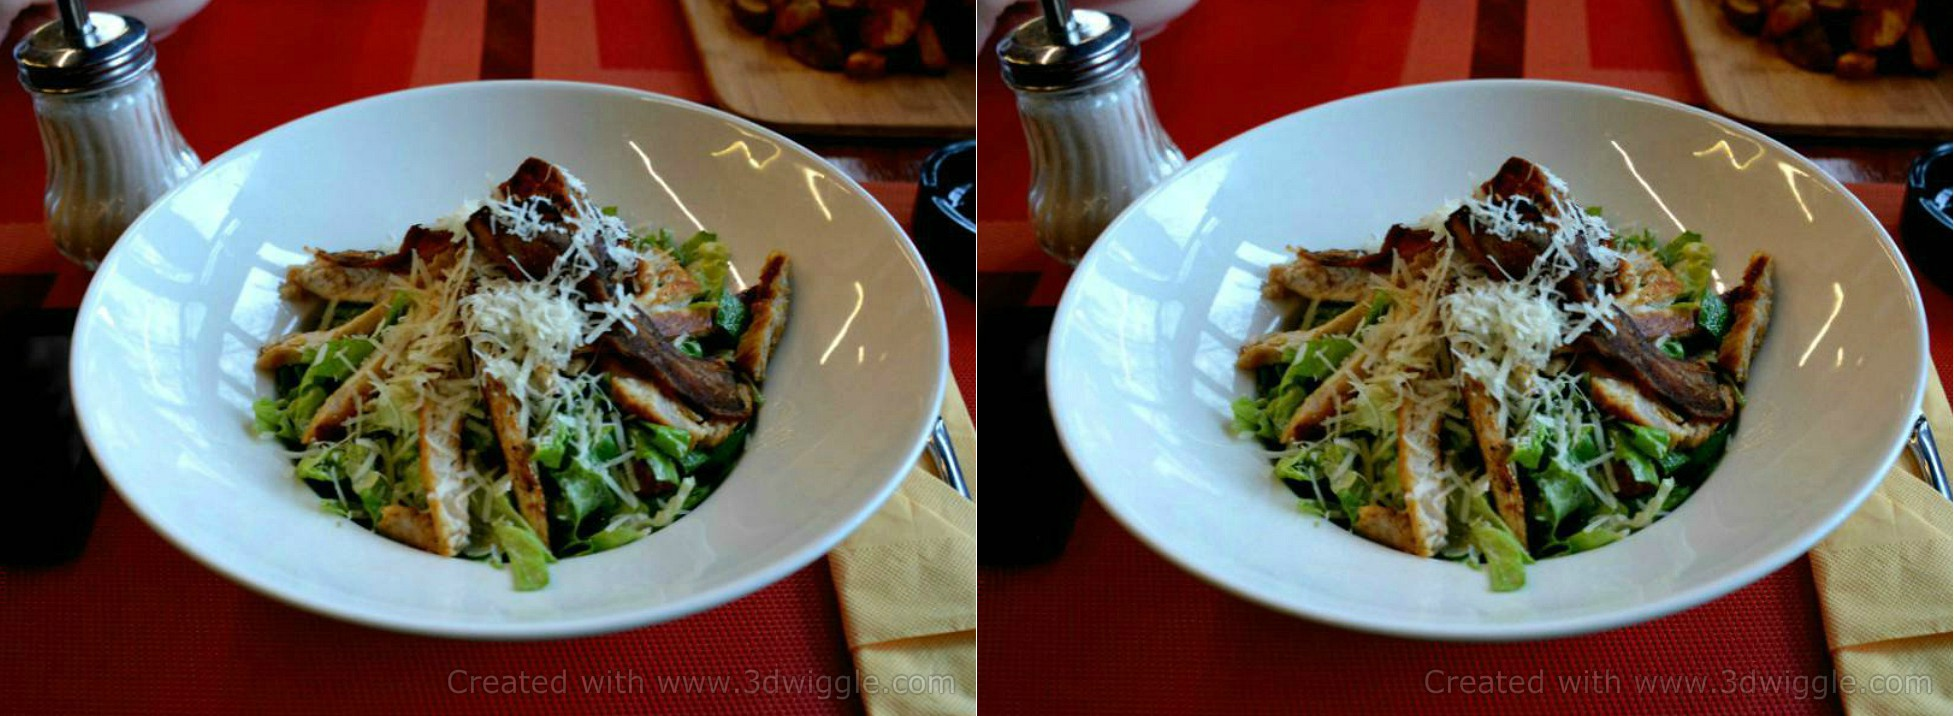 tasty caesar salad